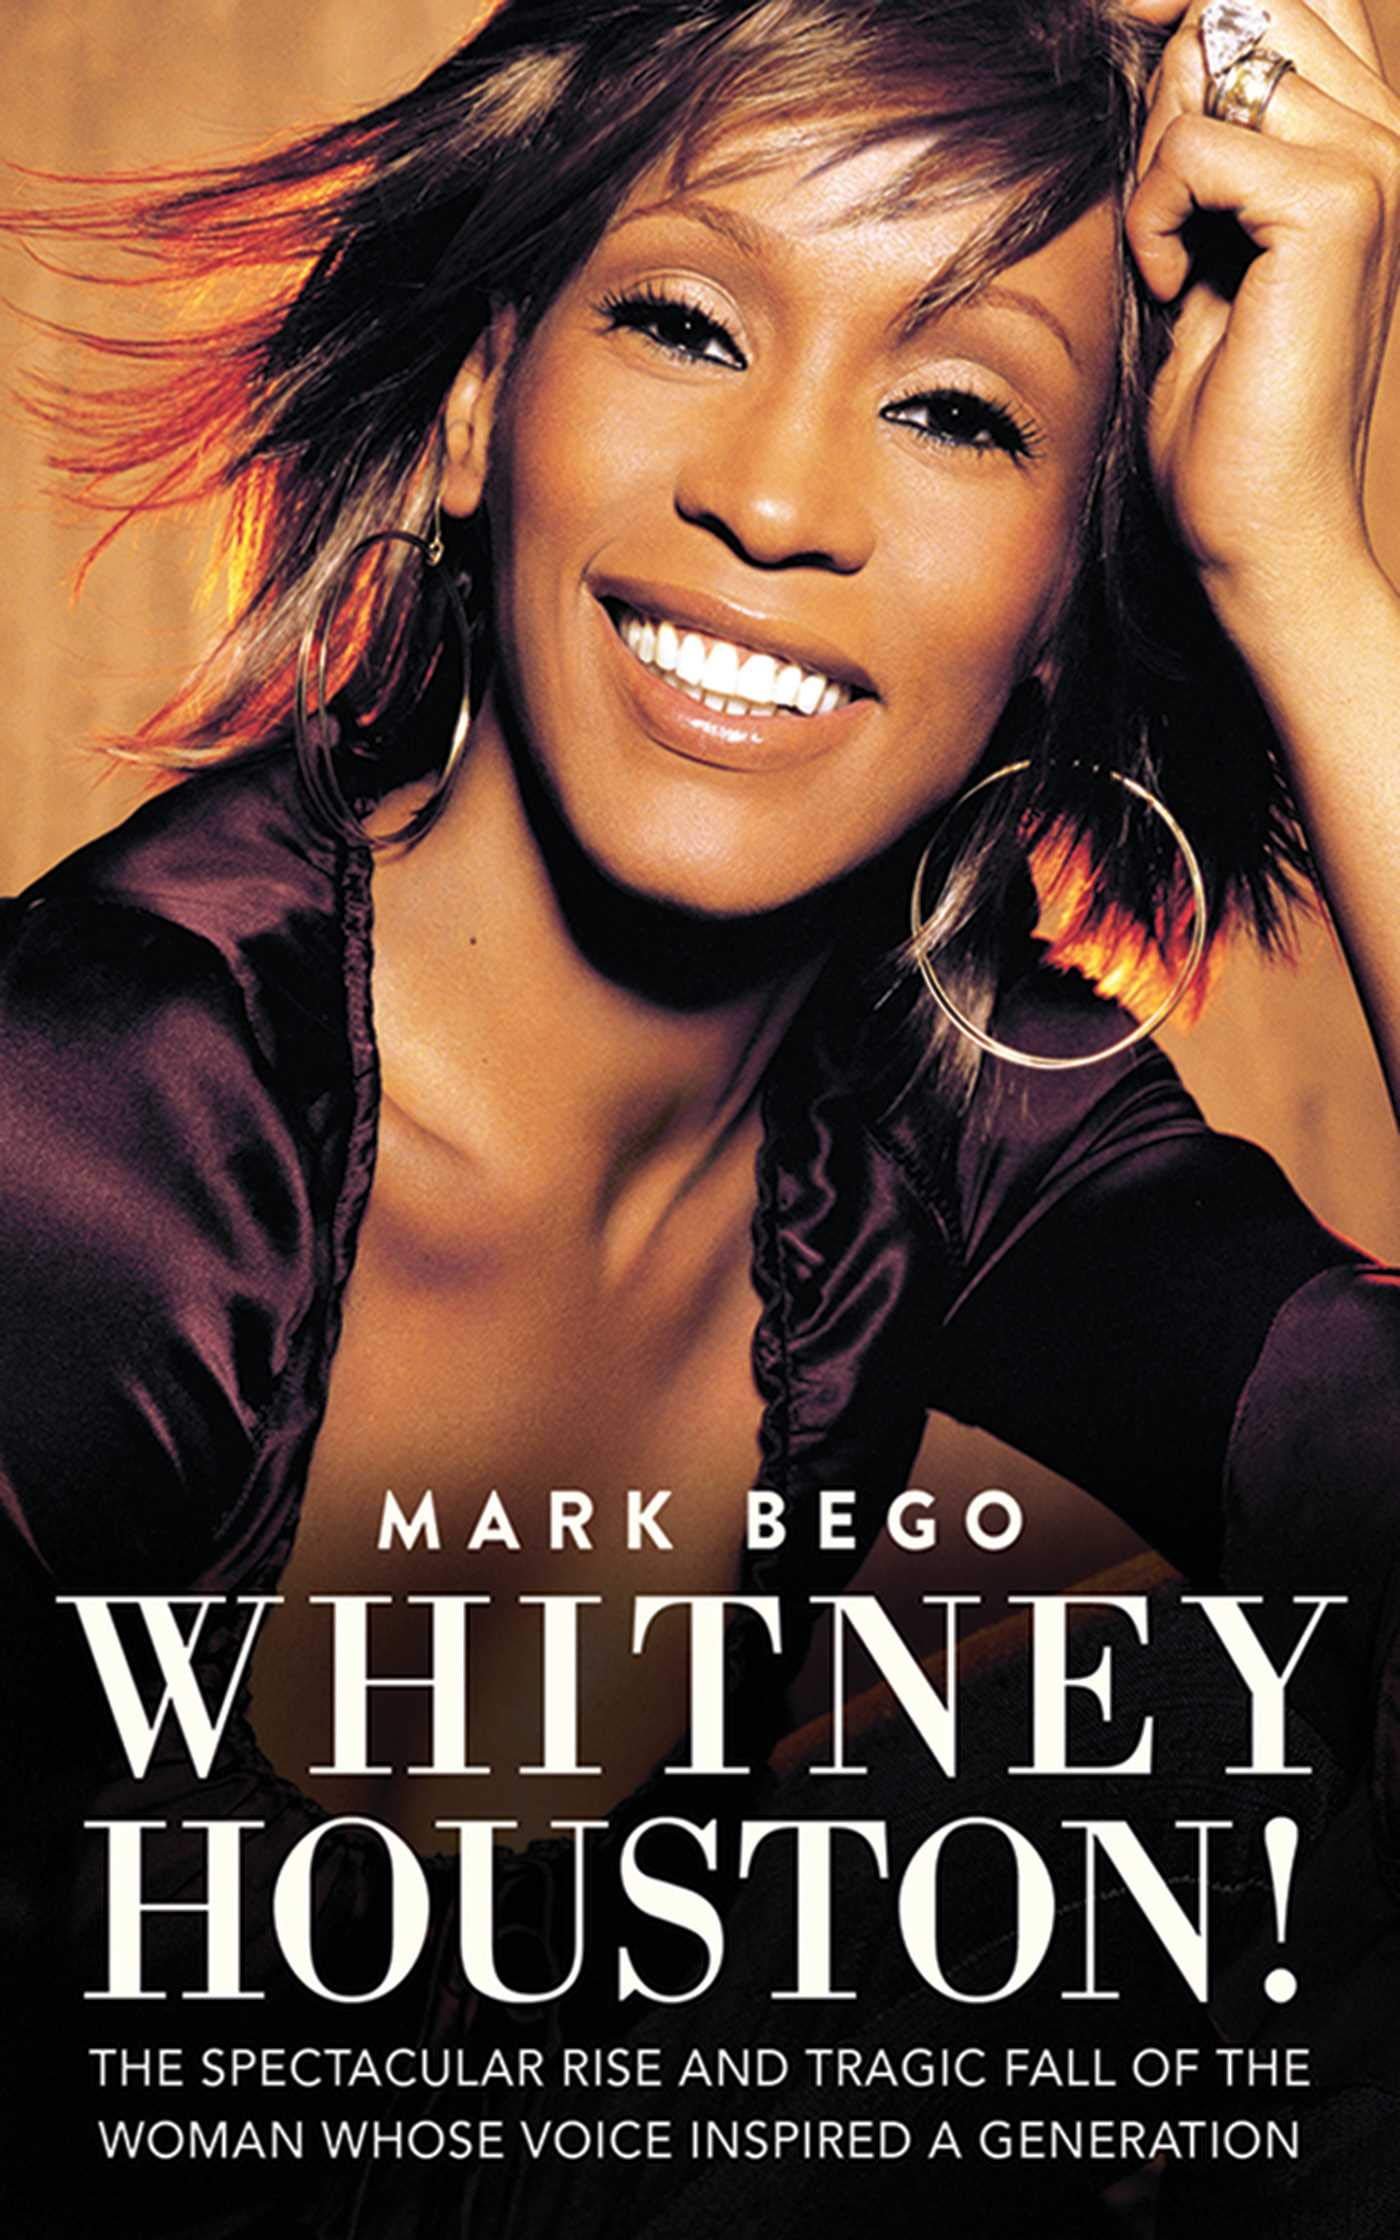 Whitney Houston 16 American Singer Actress Legend Poster Beauty Woman Signatute